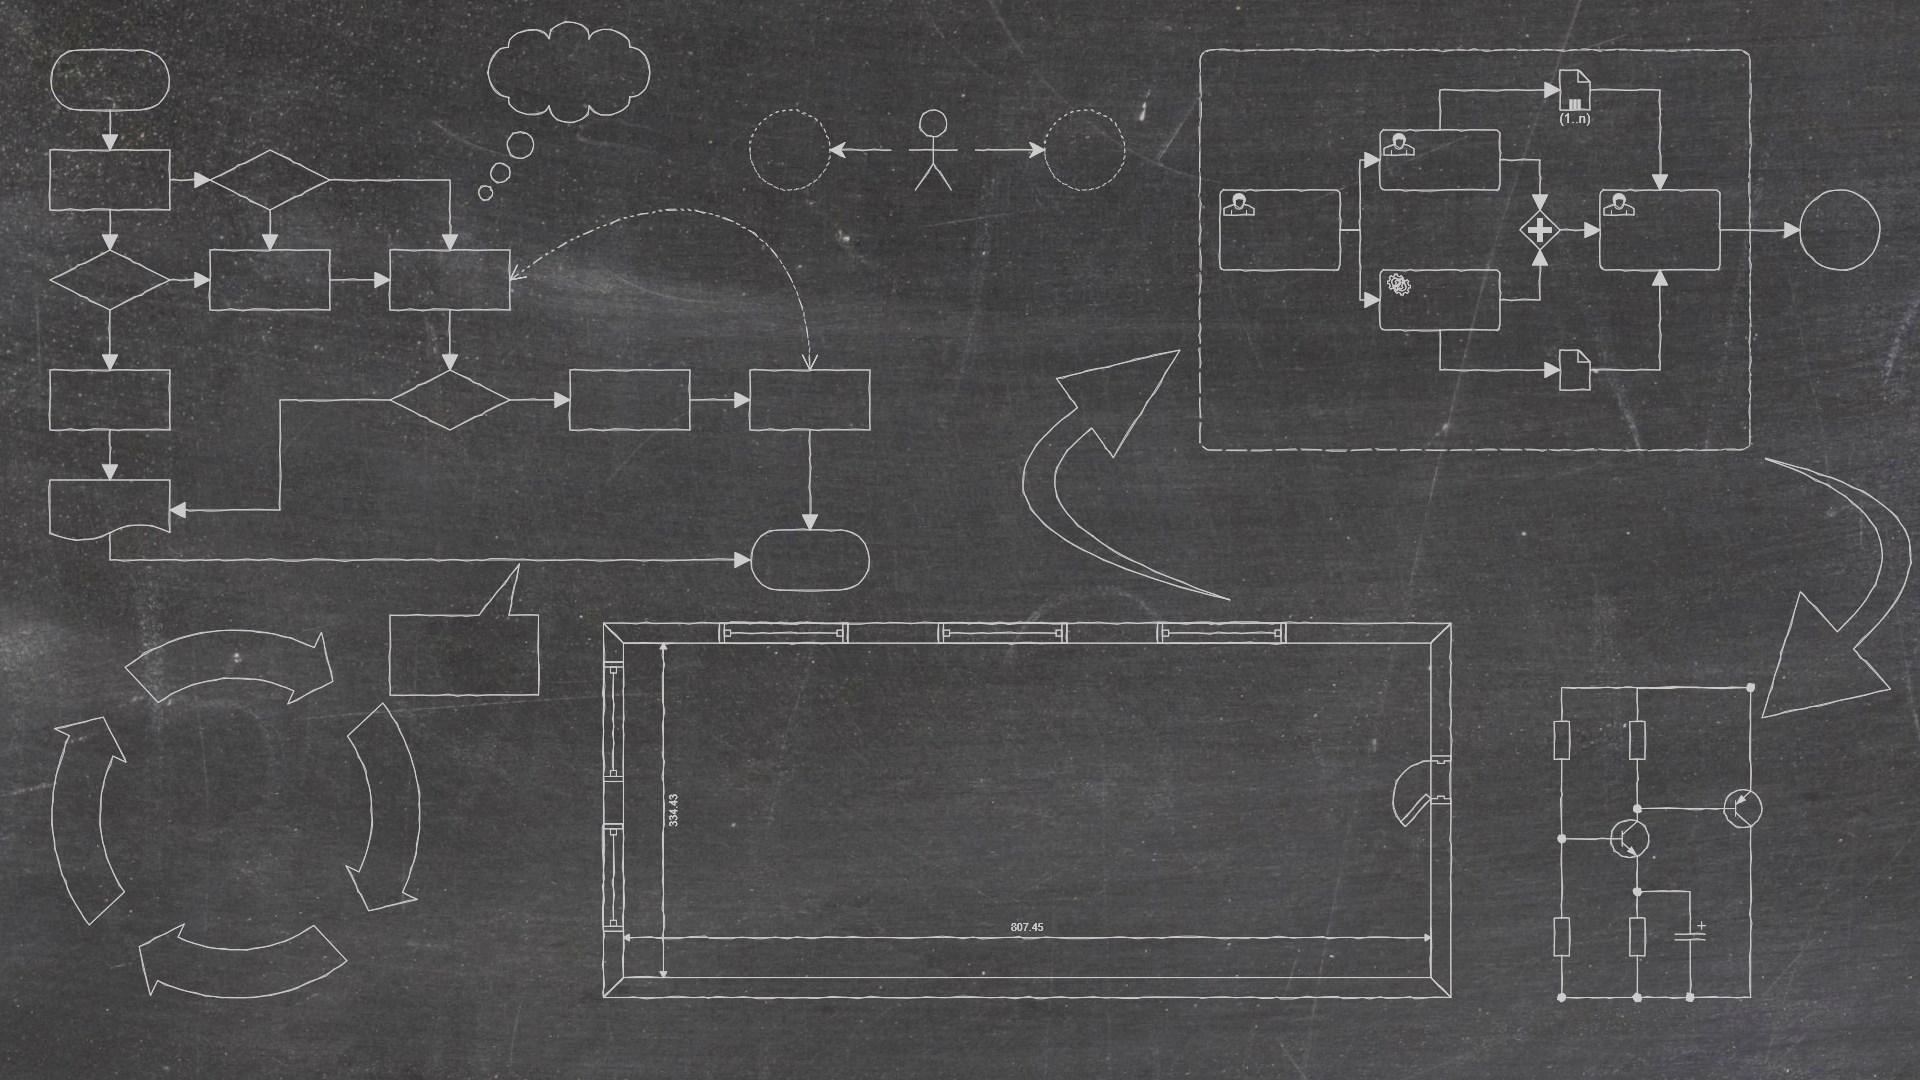 buy grapholite diagrams flow charts and floor plans designer microsoft store [ 1920 x 1080 Pixel ]